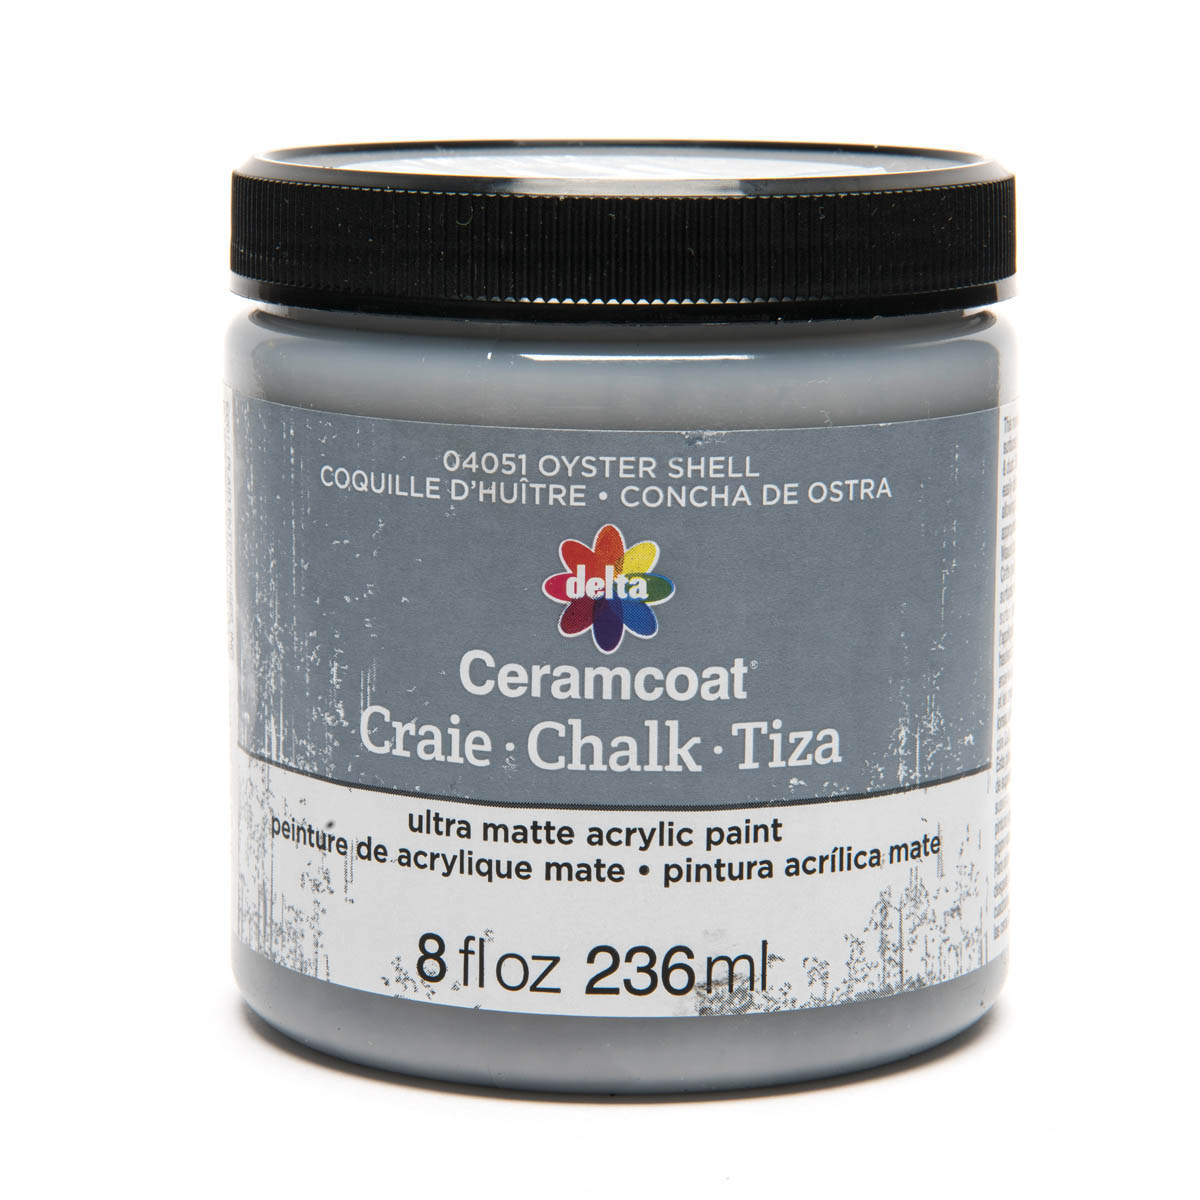 Delta Ceramcoat ® Chalk - Oyster Shell, 8 oz. - 04051